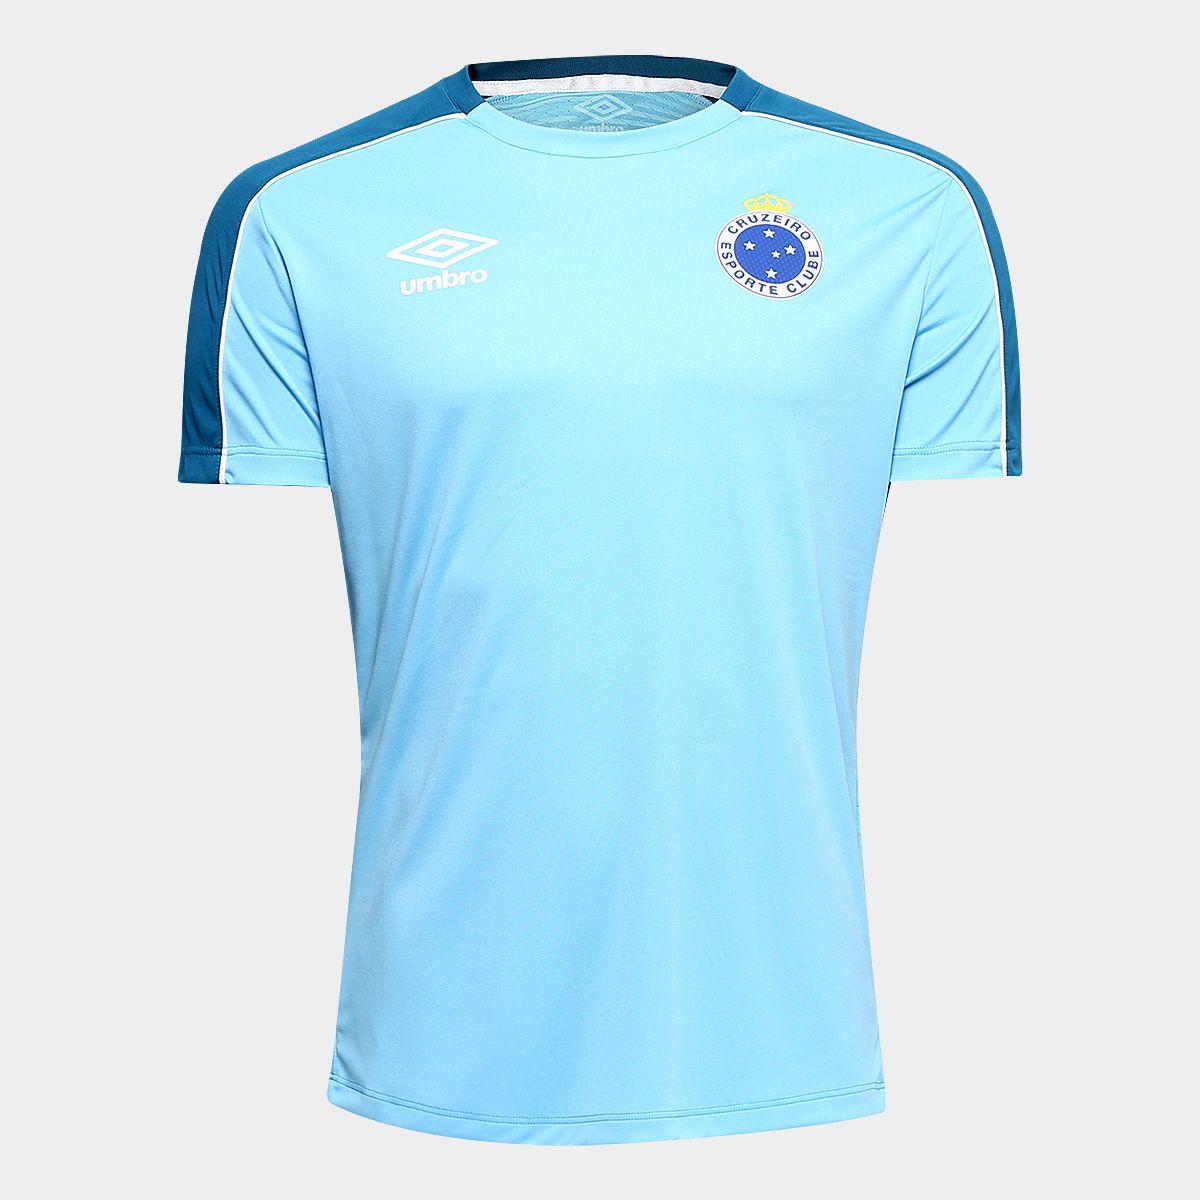 31fa59cd6adb4 Camisa Cruzeiro 2019 Treino Umbro Masculina - Azul e Branco - Point ...